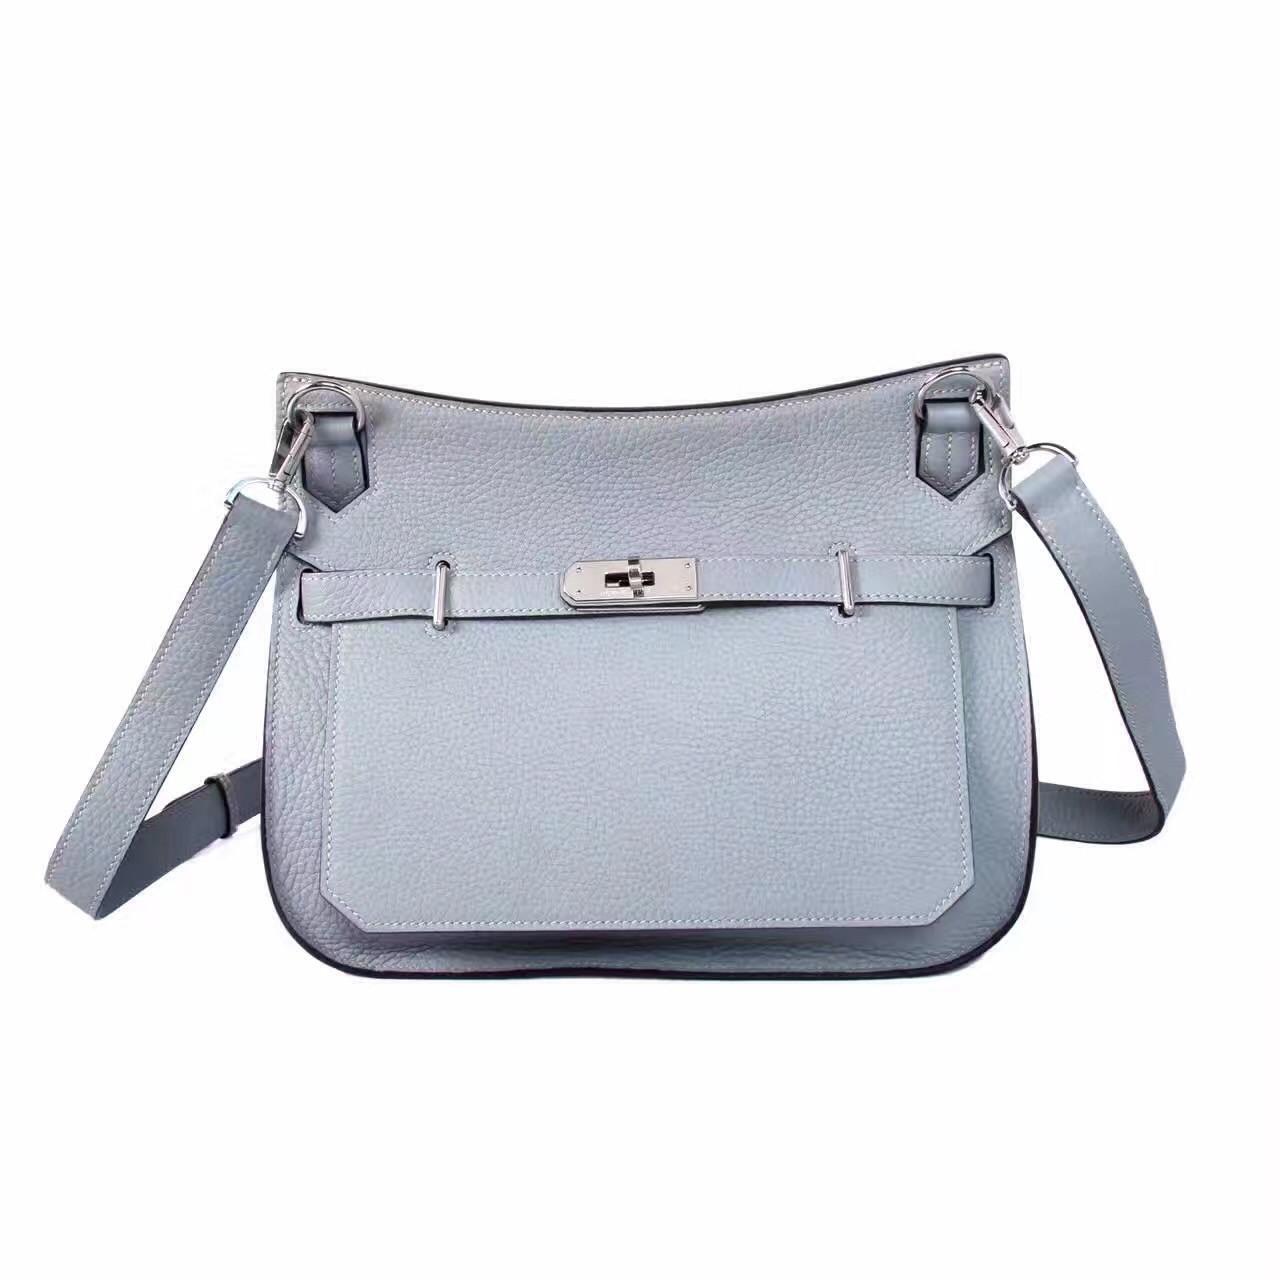 9c95b01d5d3f Hermes Blue Lin Jypsiere 28 bag - Bella Vita Moda